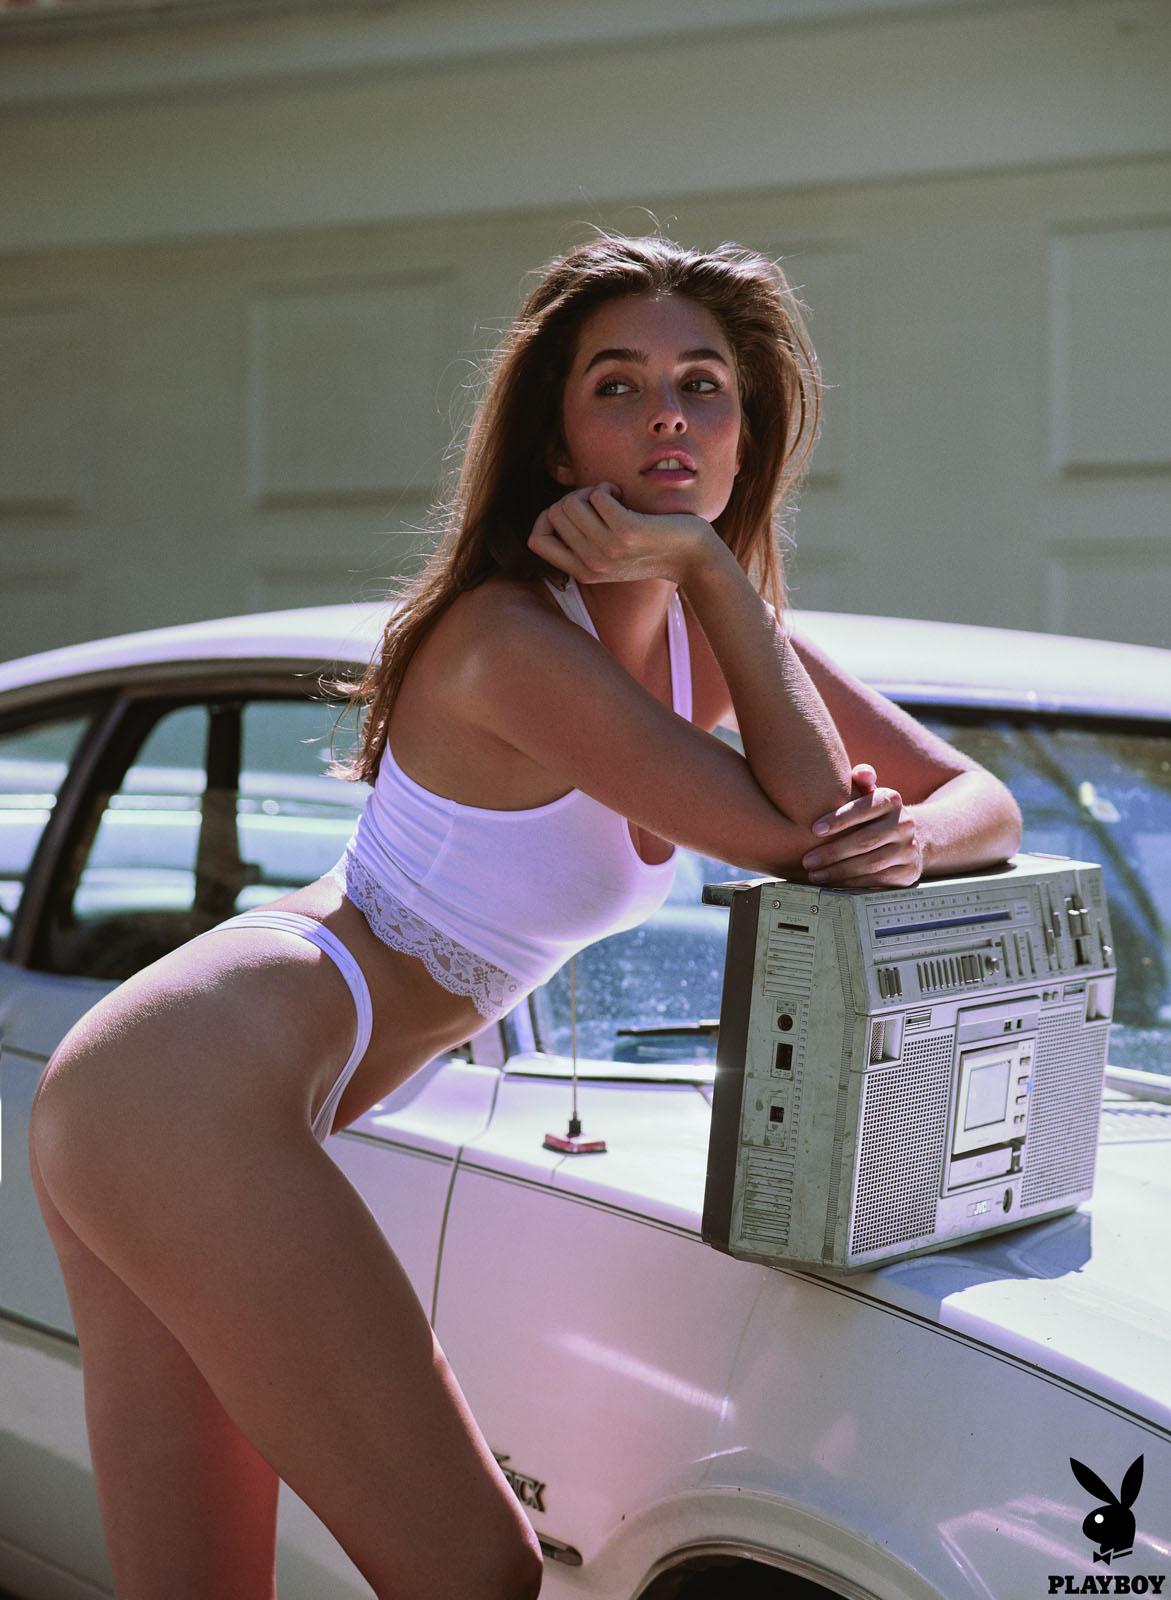 Candice swanepoel boobs,Zoie burgher nude Porno photo Leigh anne pinnock butt,Willa holland nude